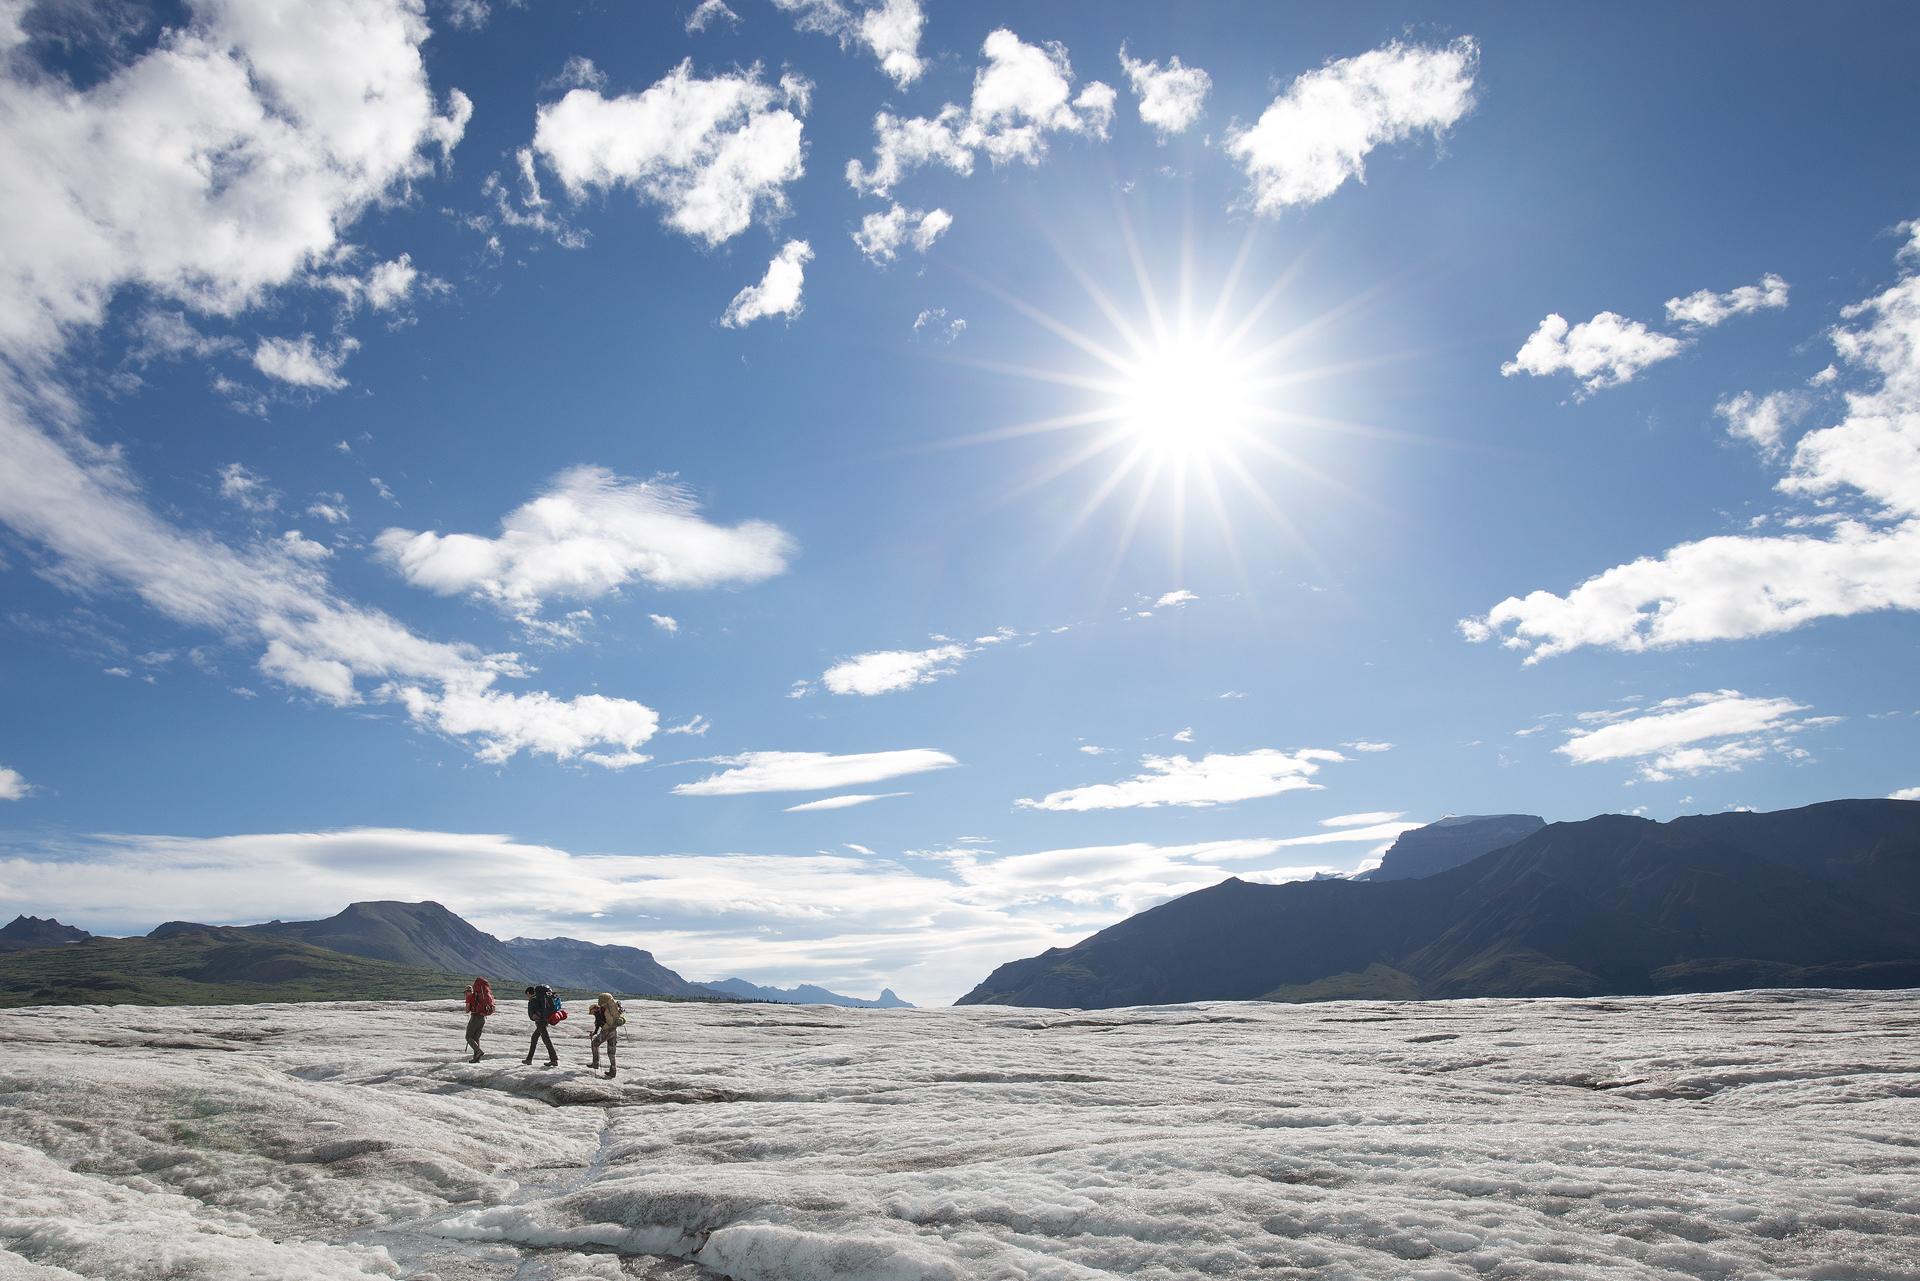 Wrangell-St. Elias National Park Nizina Lake to Skolai Pass--19.jpg